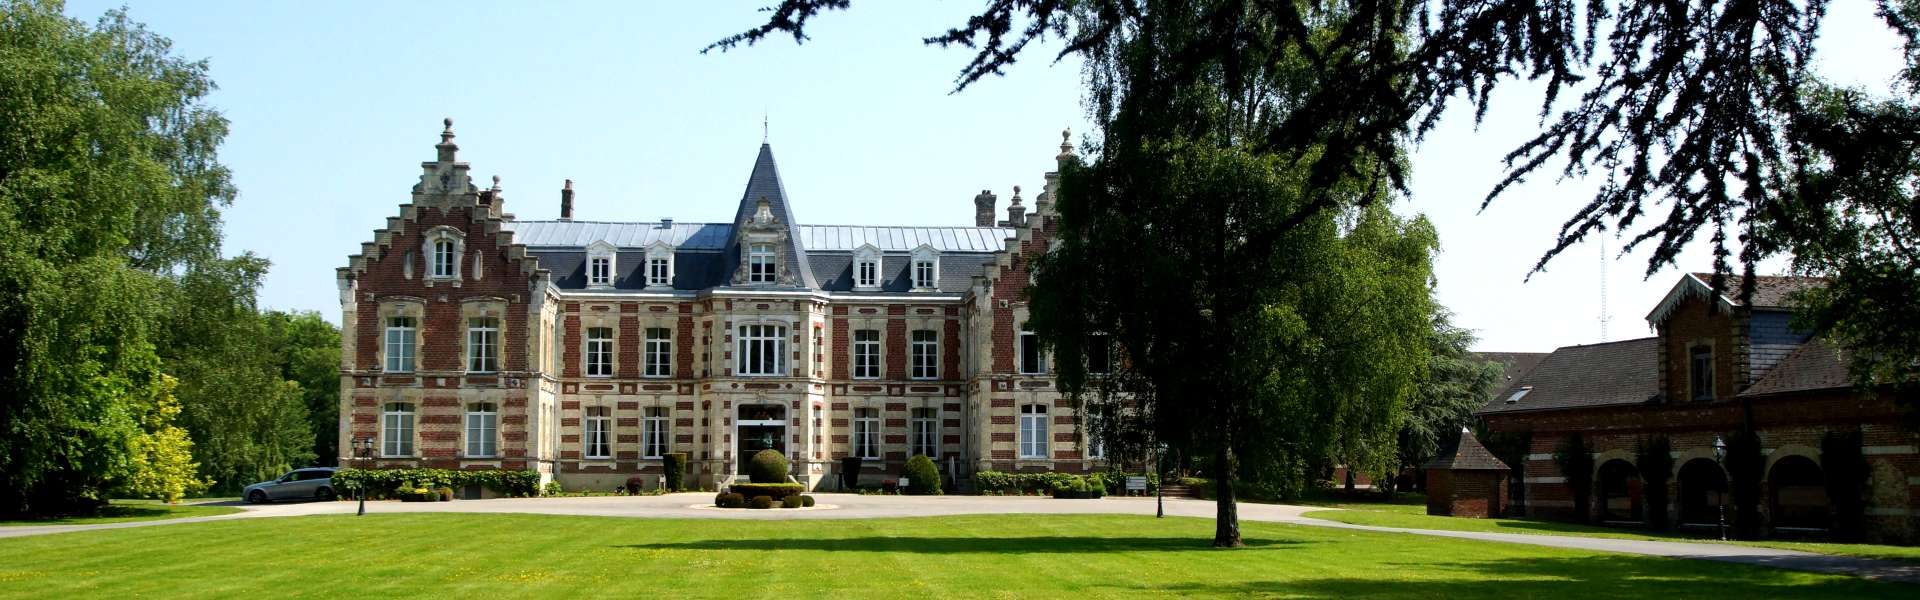 Façade du Najeti Hôtel Château Tilques proche de Saint-Omer.